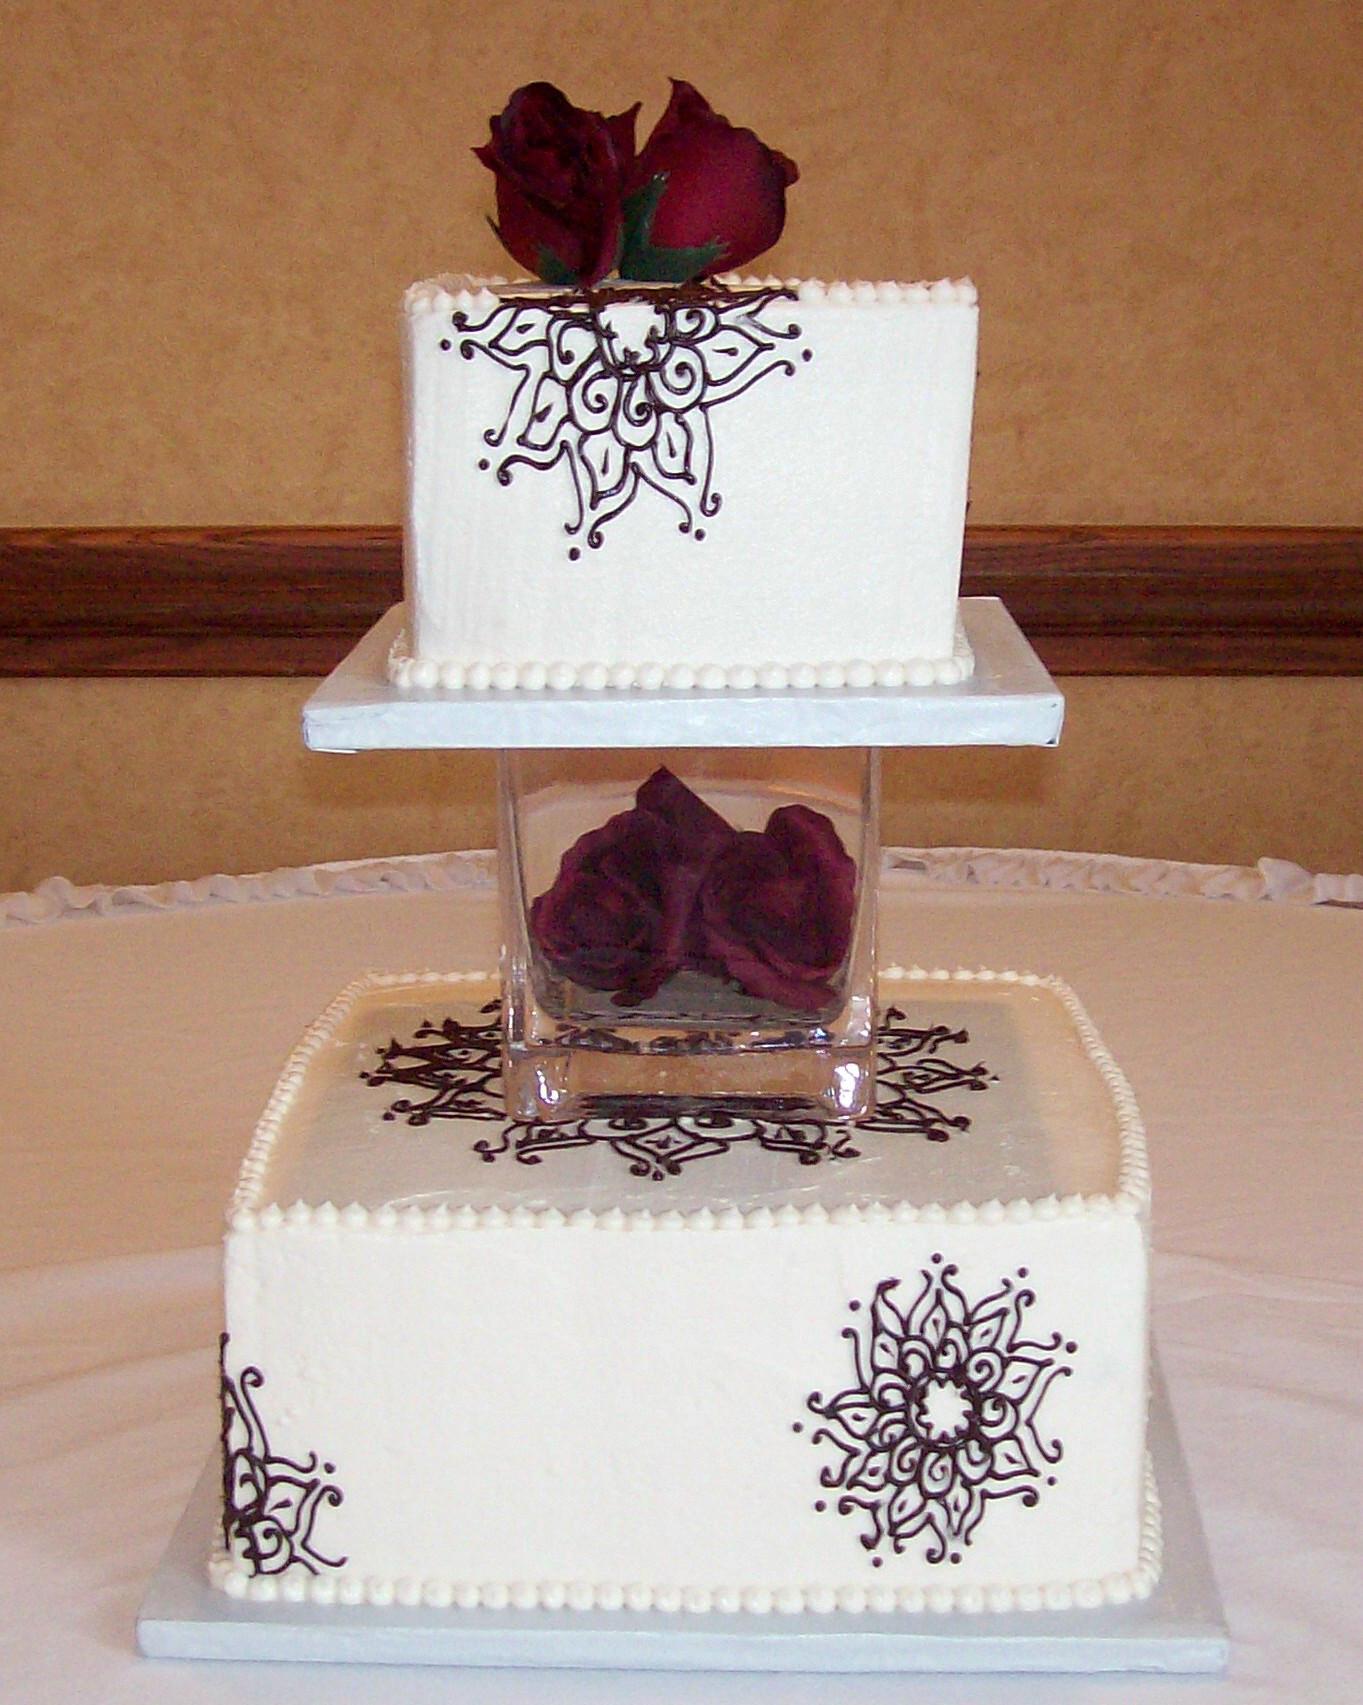 Wedding Cakes Sioux Falls Sd  Sioux Falls Wedding Cakes South Dakota